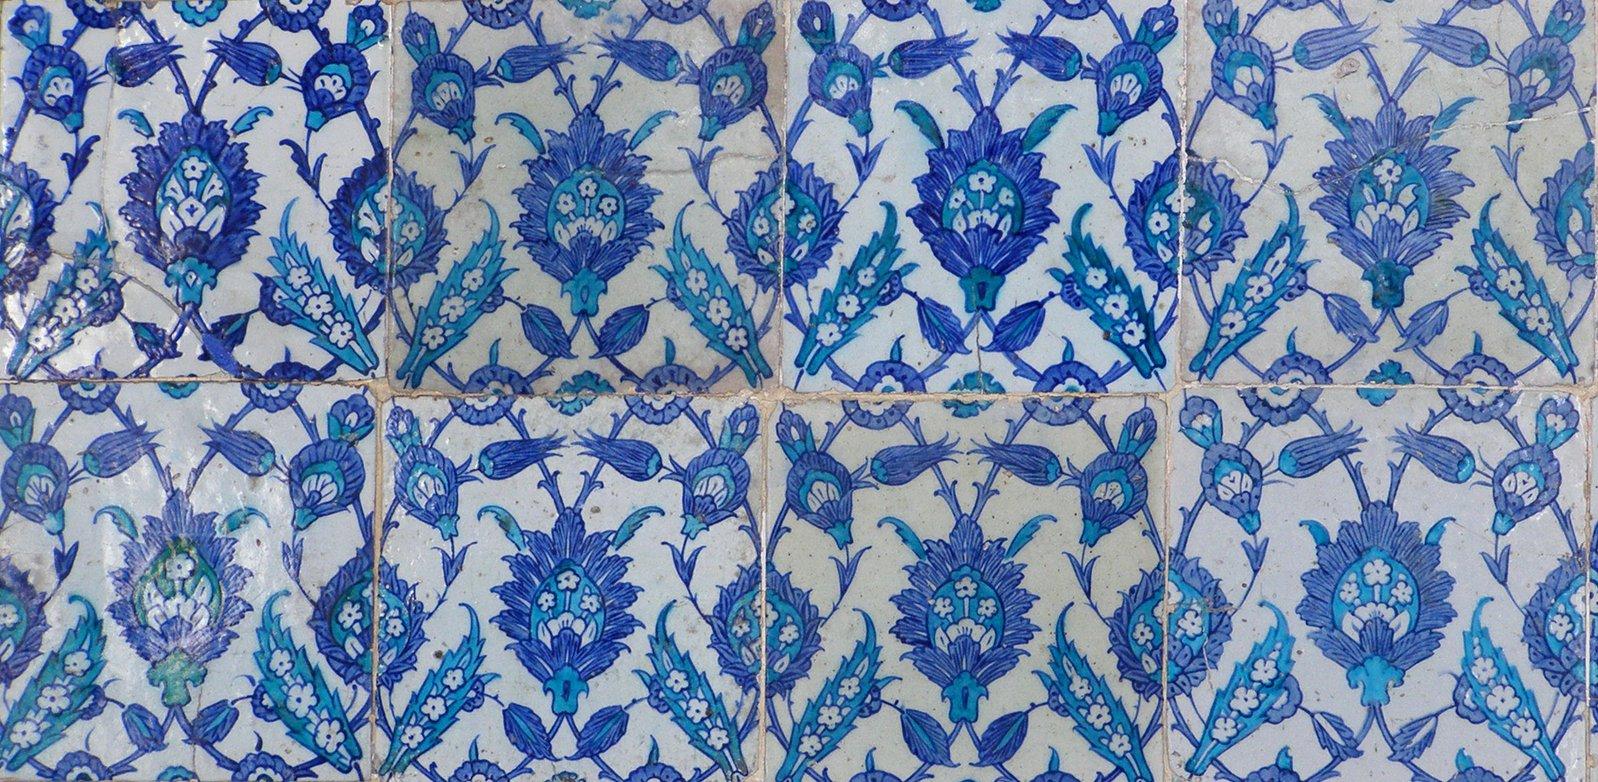 Free Islamic Tiles Stock Photo - FreeImages com